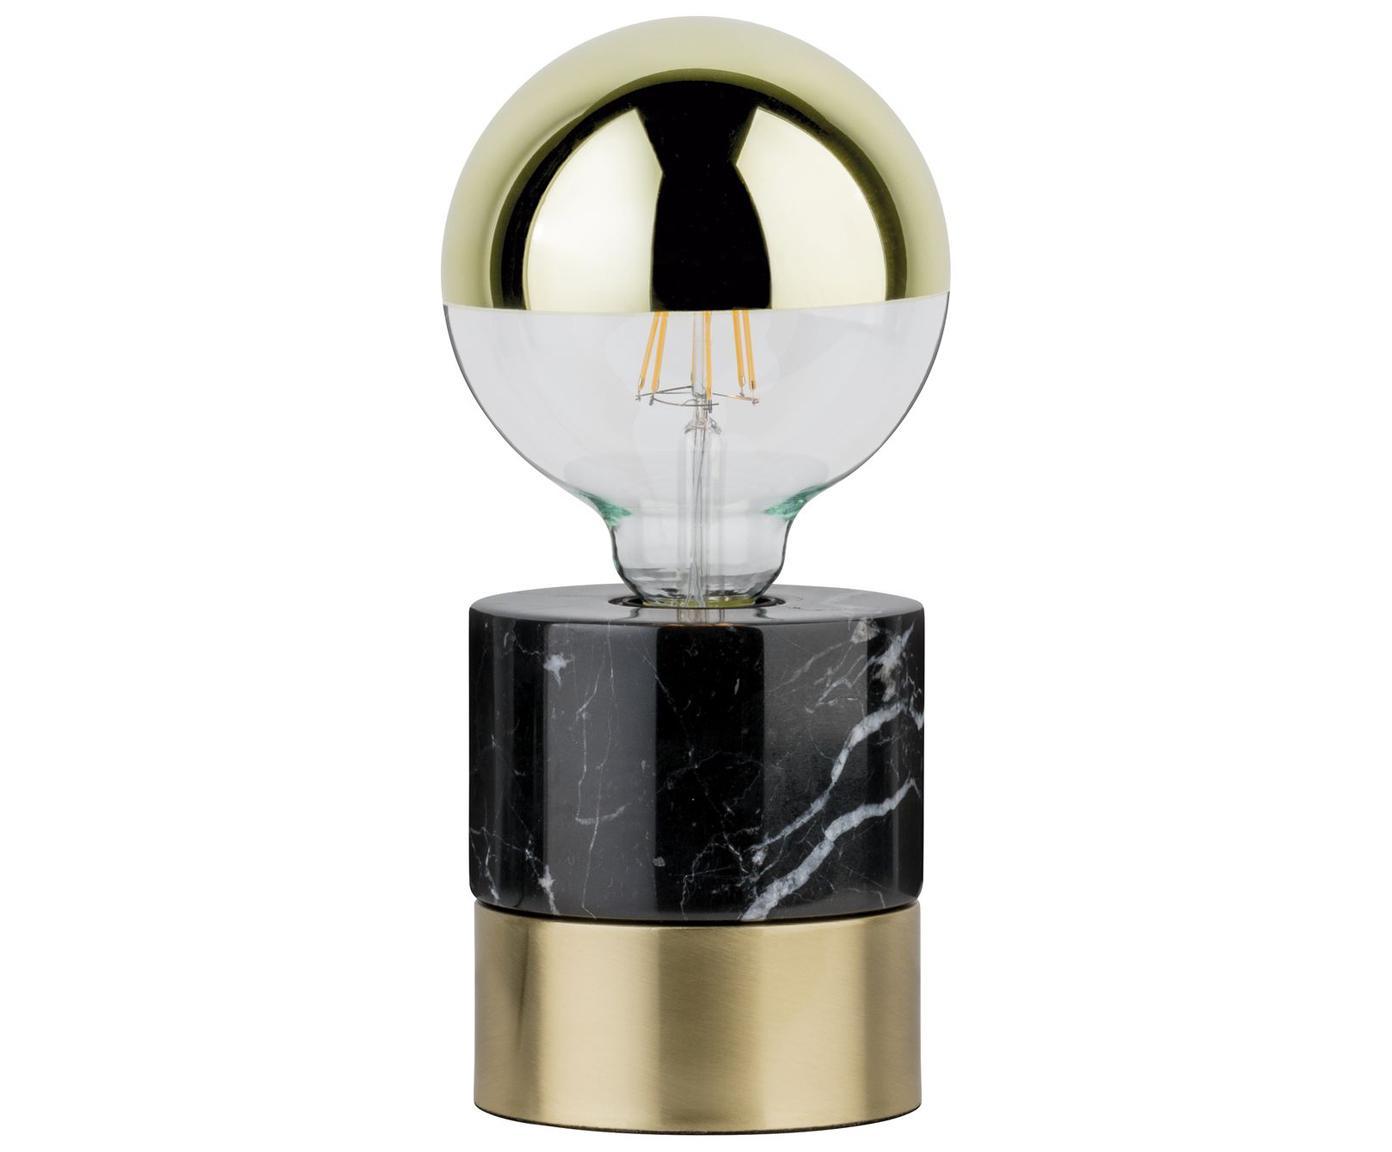 Marmeren tafellamp Vala, Zwart, messingkleurig, Ø 11 x H 12 cm